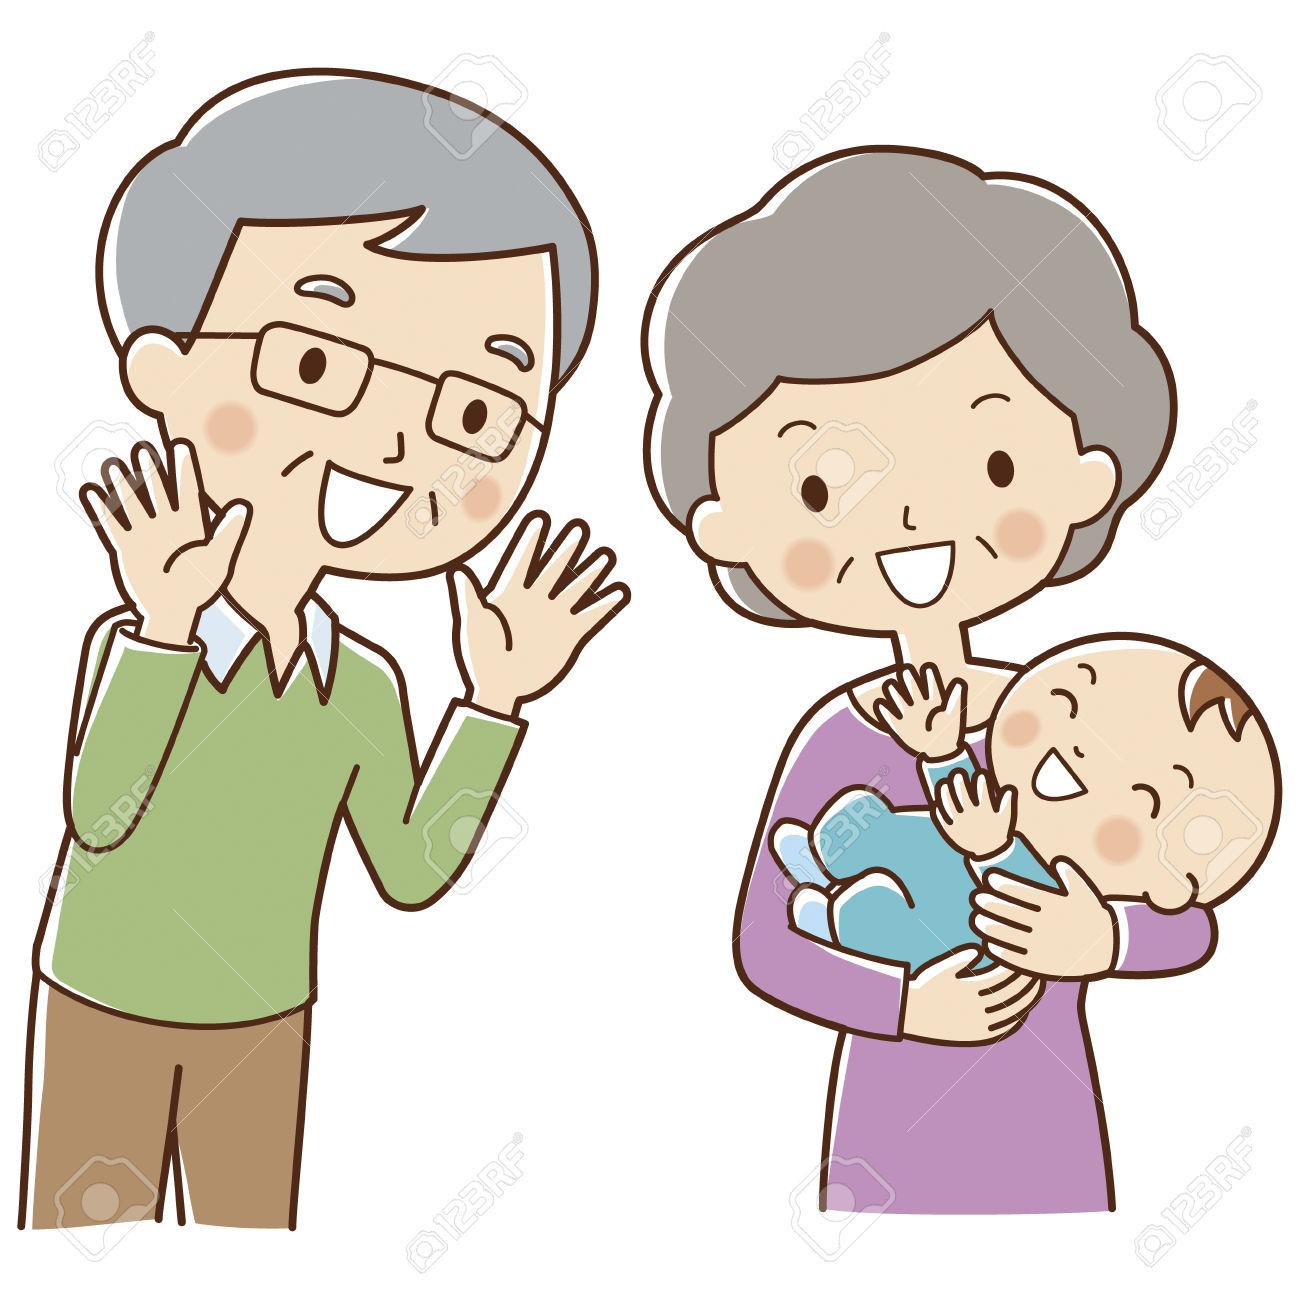 Grandma And Baby Clipart.